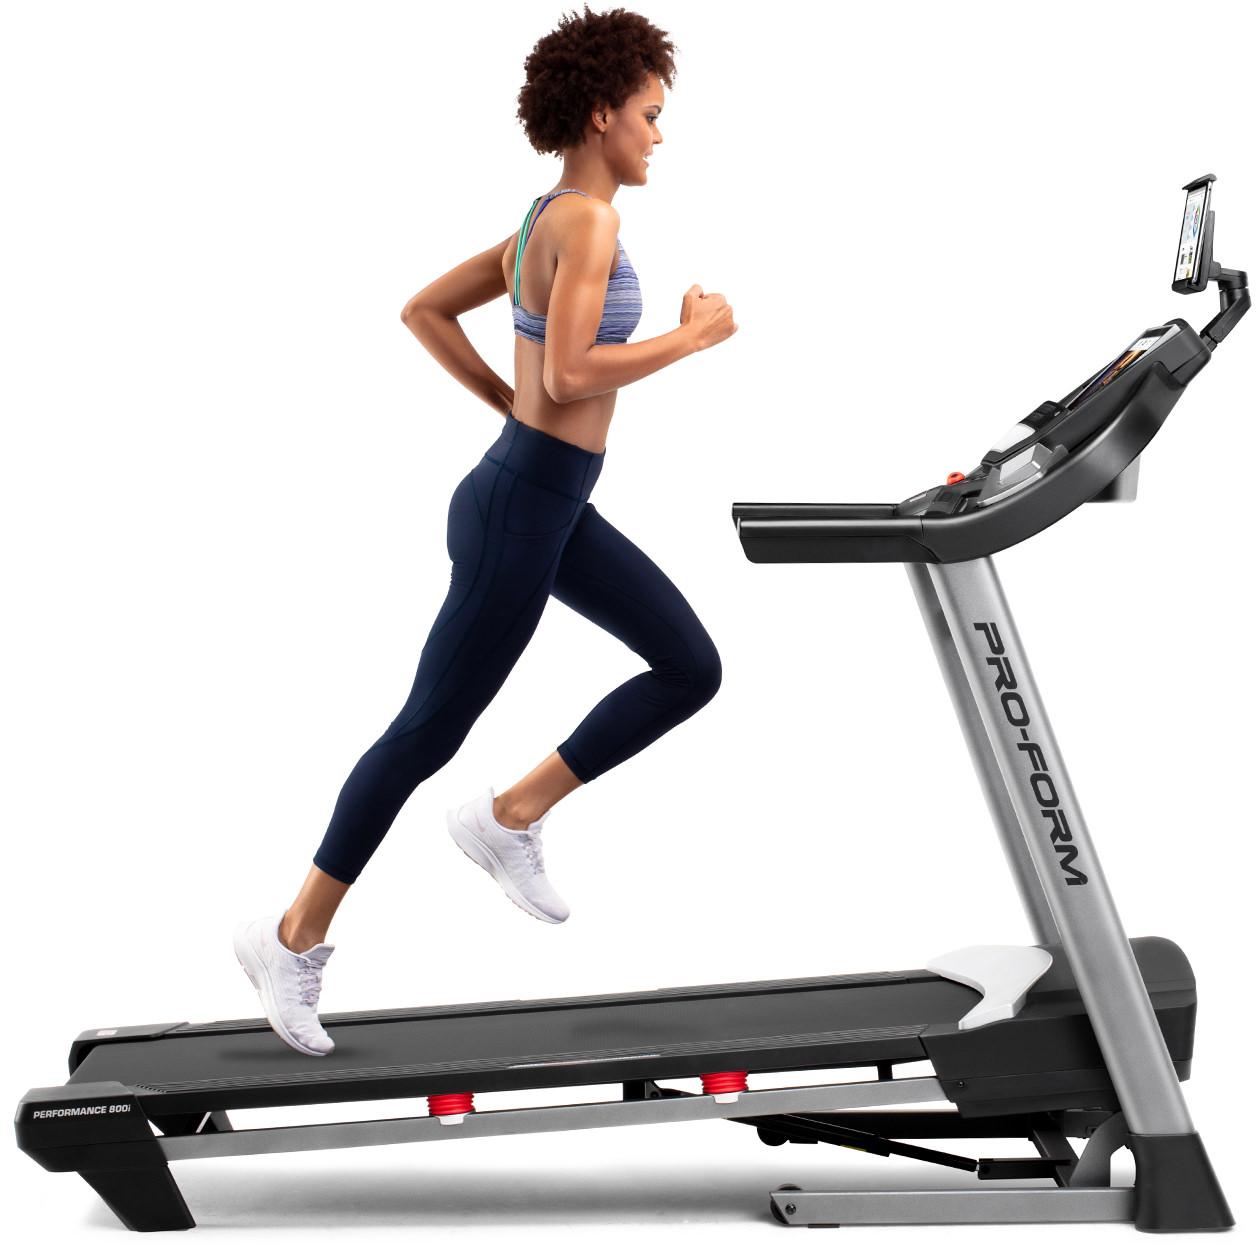 ProForm Treadmills Specials SMART Performance 800i  gallery image 5